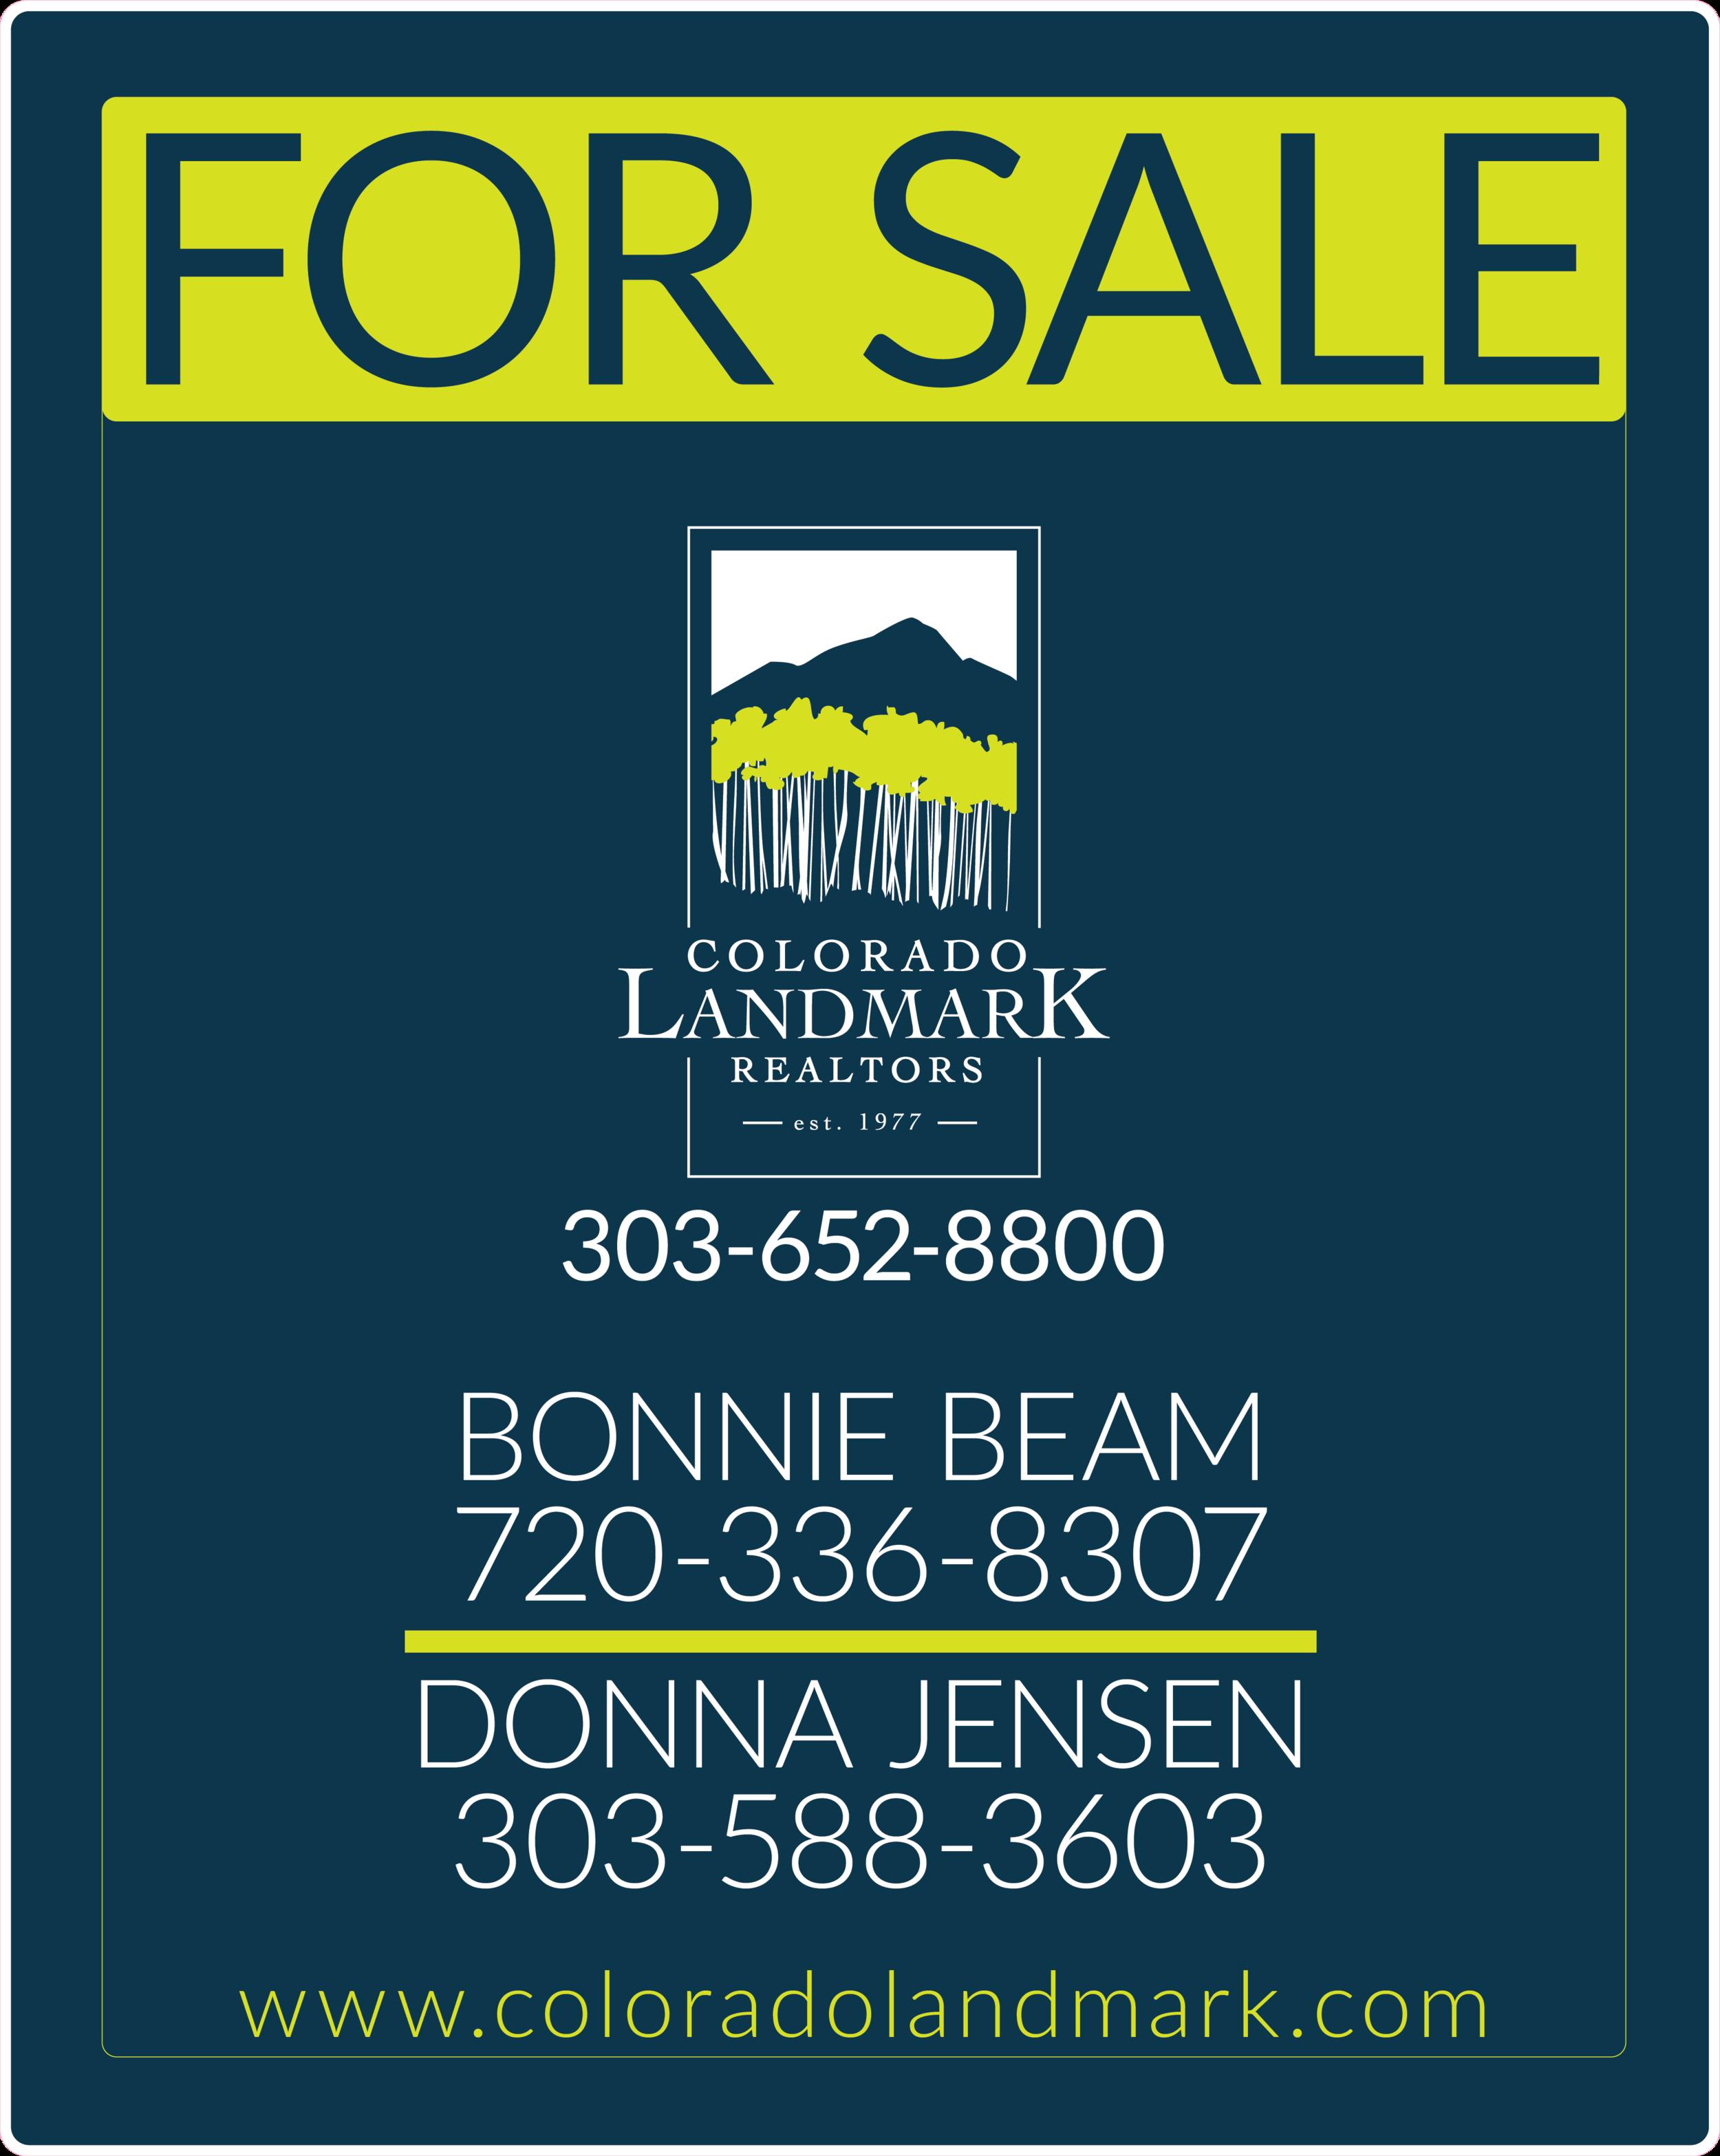 Colorado Landmark Bonnie Beam_Donna Jensen 30x24 FOR SALE STEEL YARD ARM SIGN Proof 04-08-19-01.png